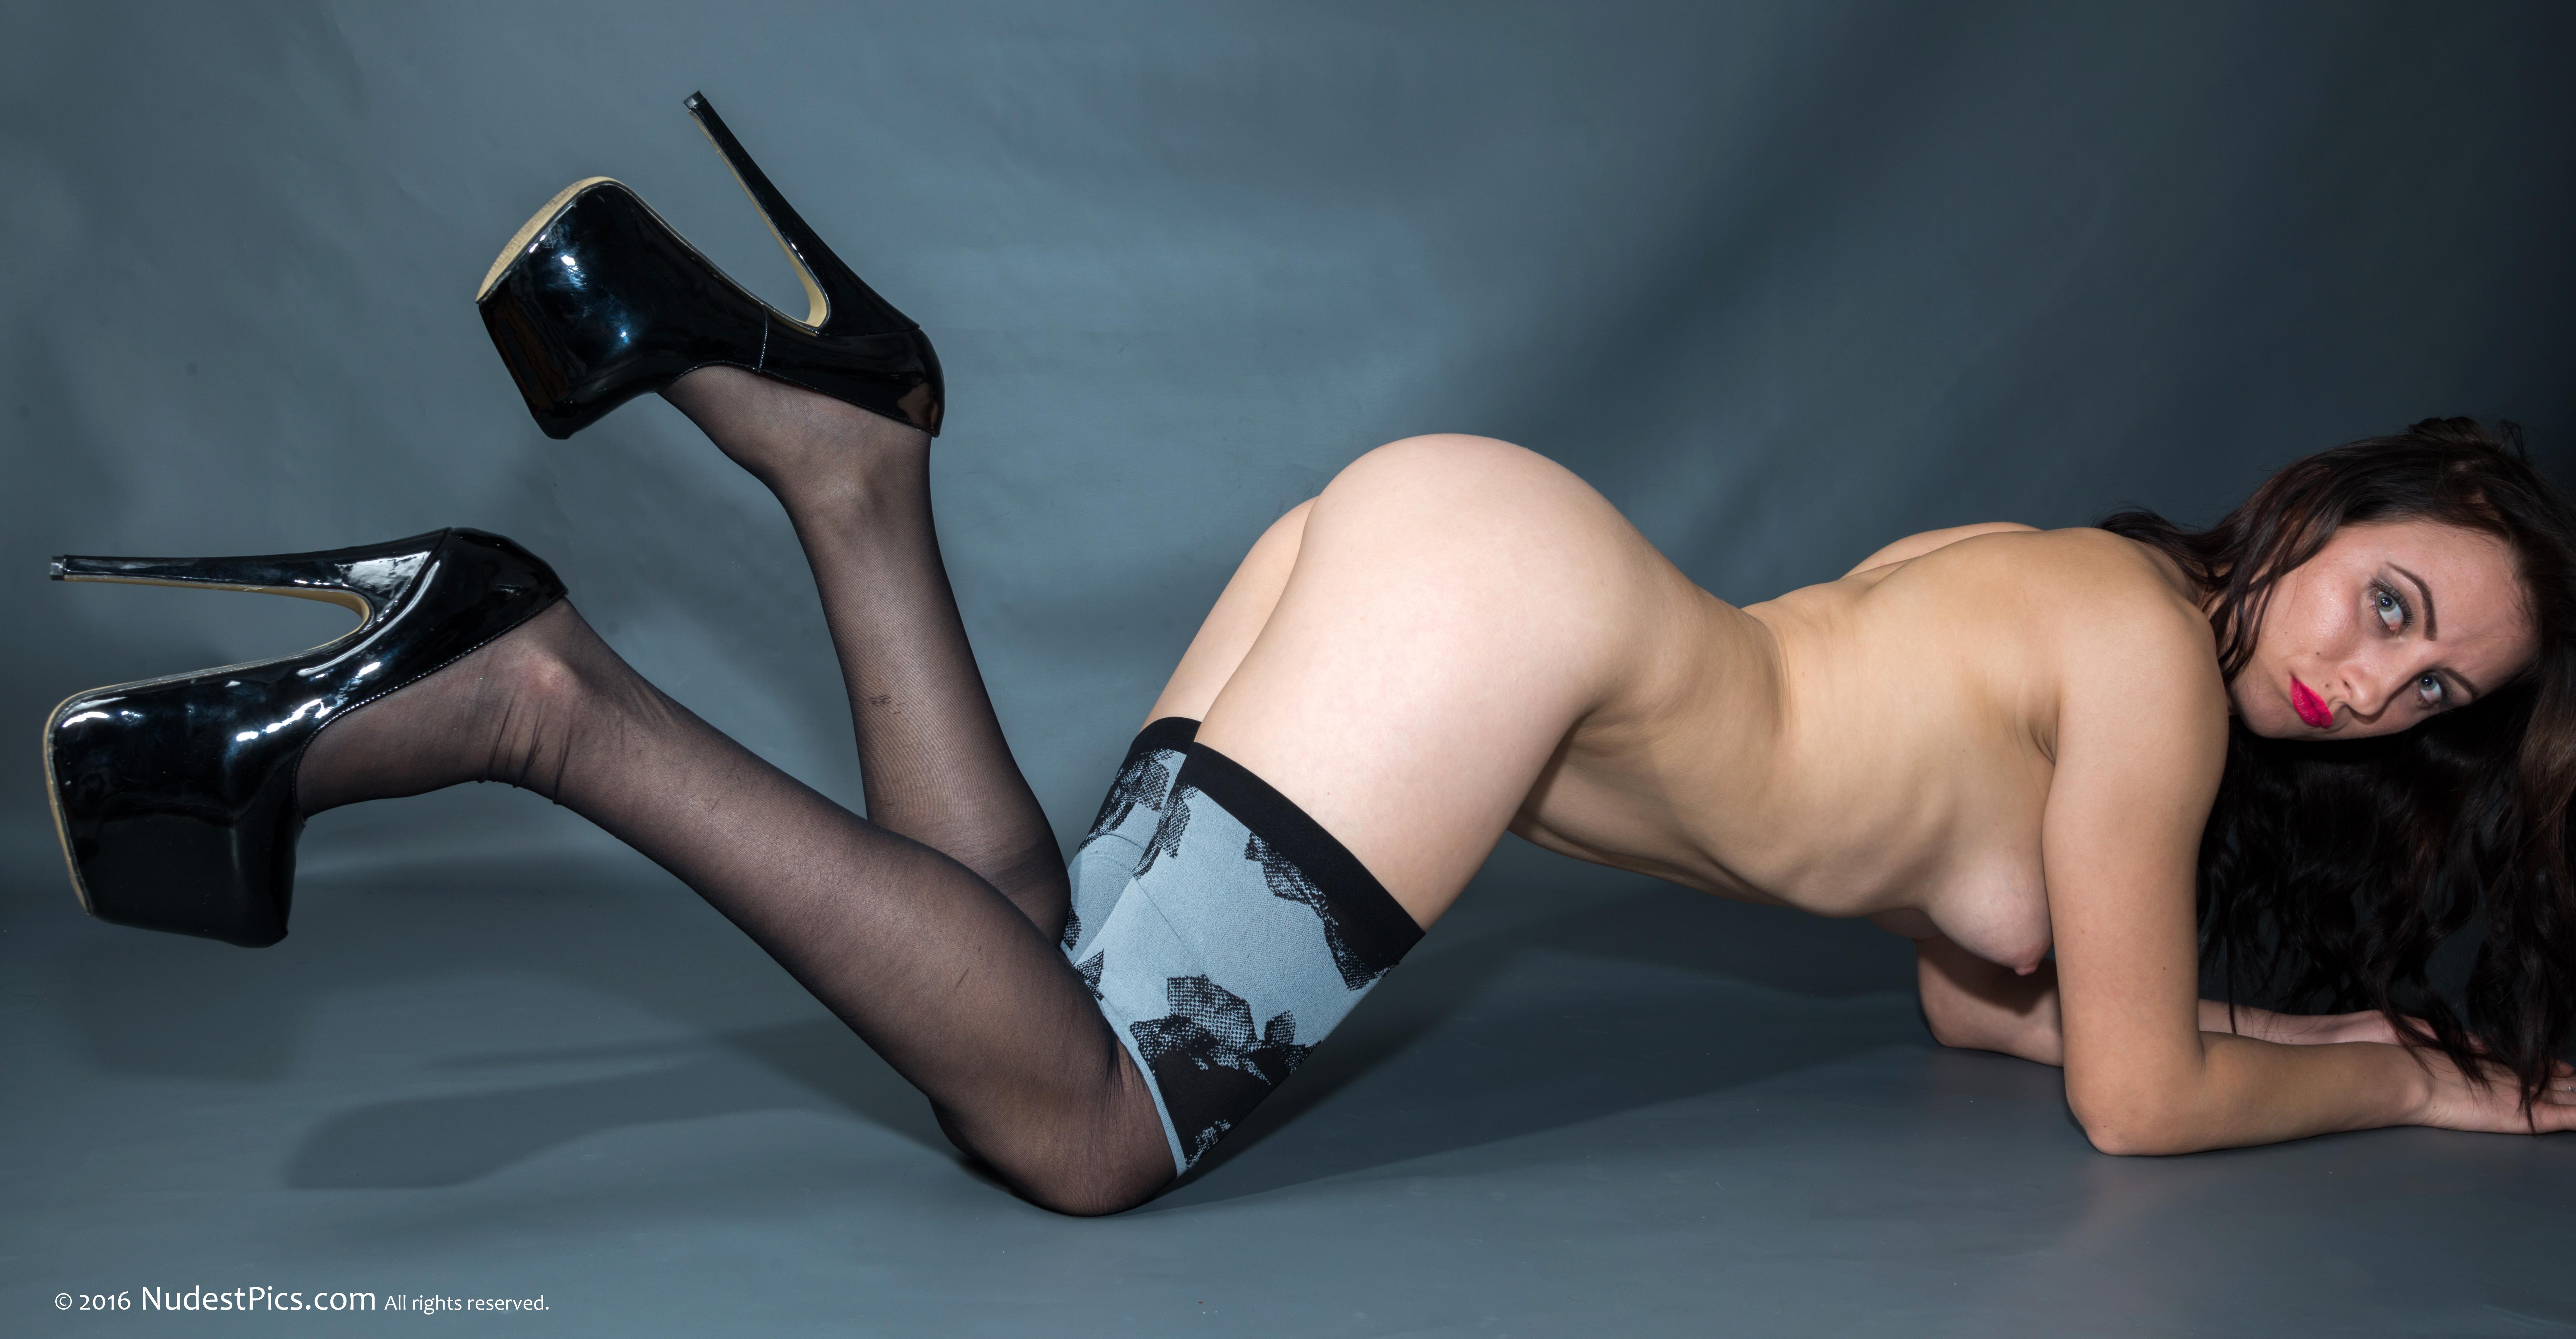 Naked Slim French Girl Sideways full HD